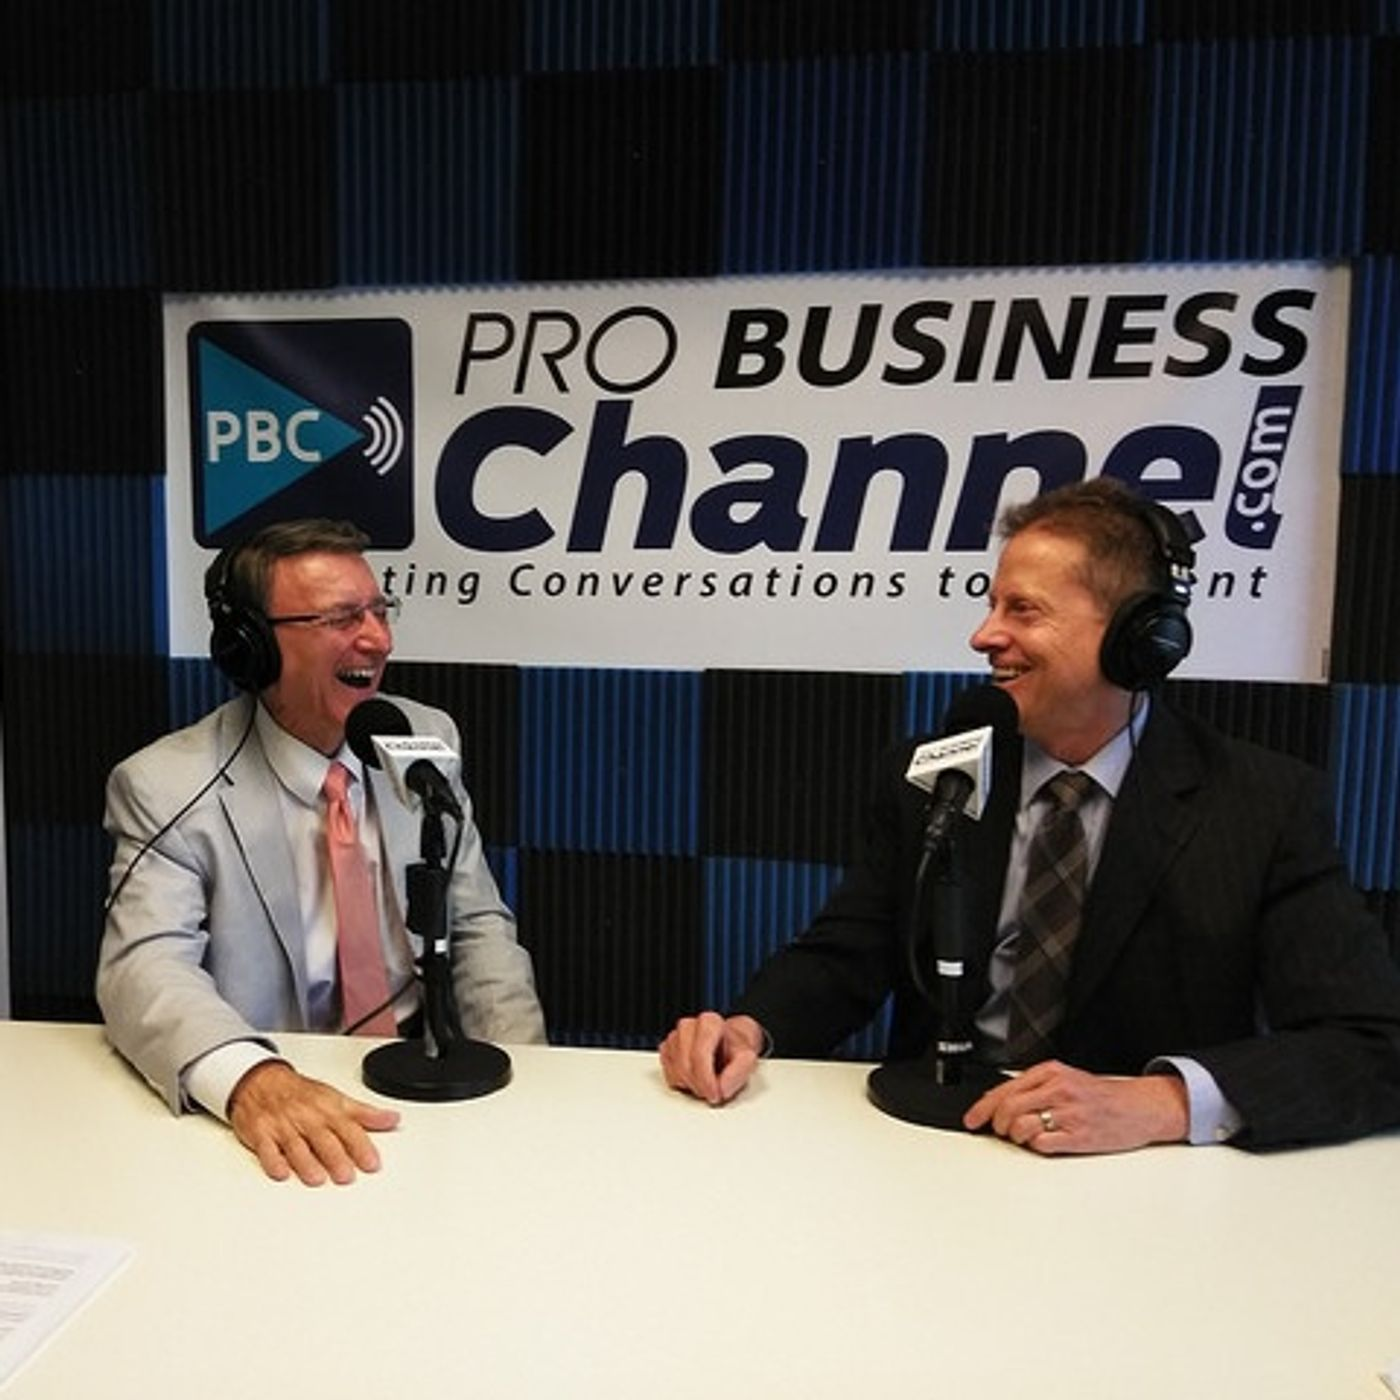 Jeff Plank of HLB Gross Collins Talks Profit Enhancement, Tech Start-ups, Mindshop and More